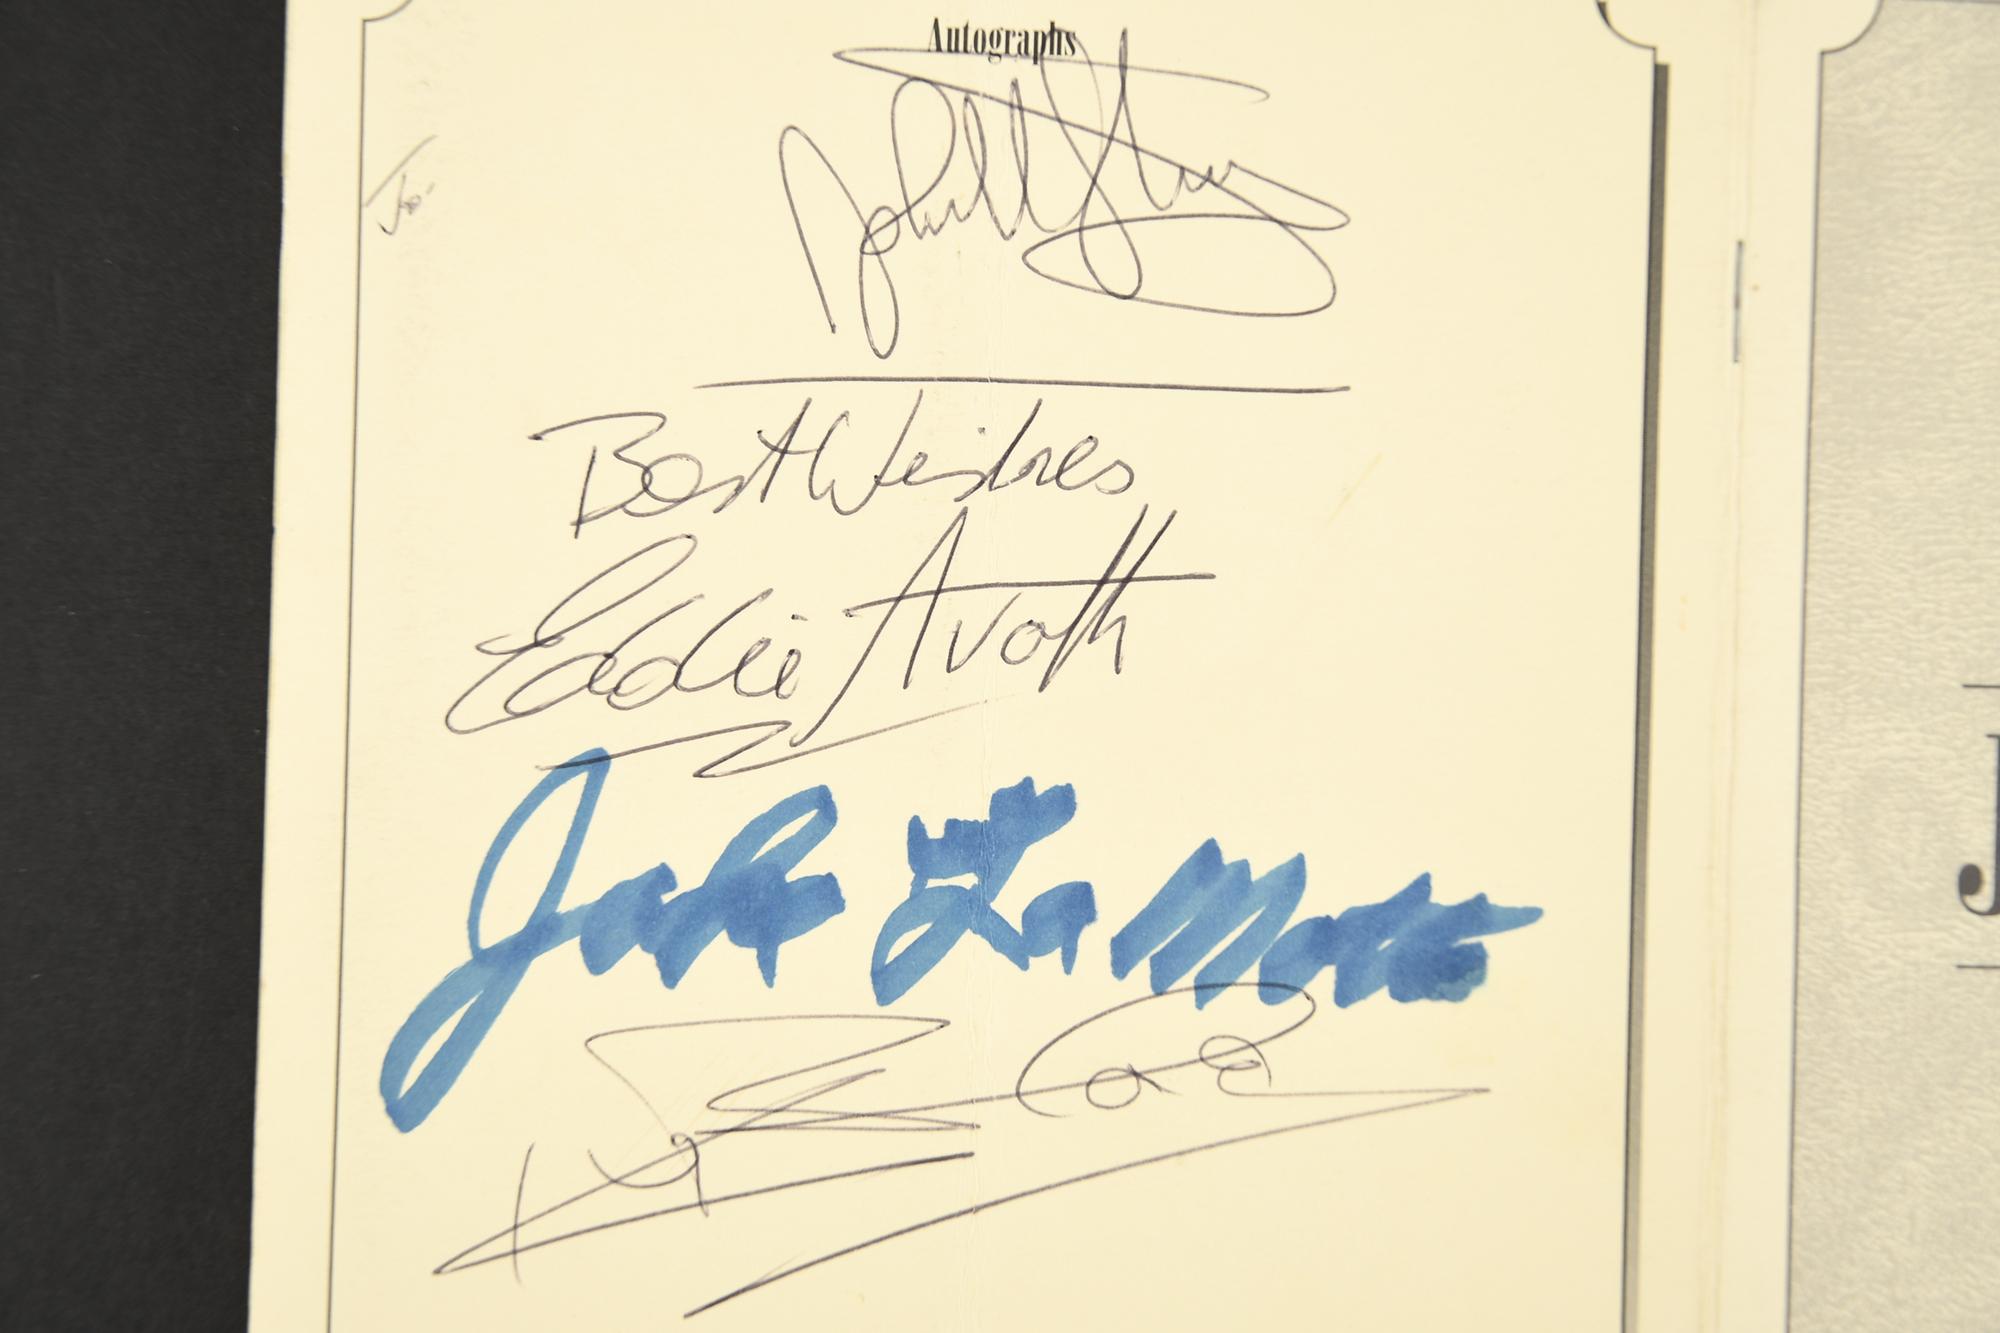 JAKE LA MOTTA Original signature - Image 2 of 3